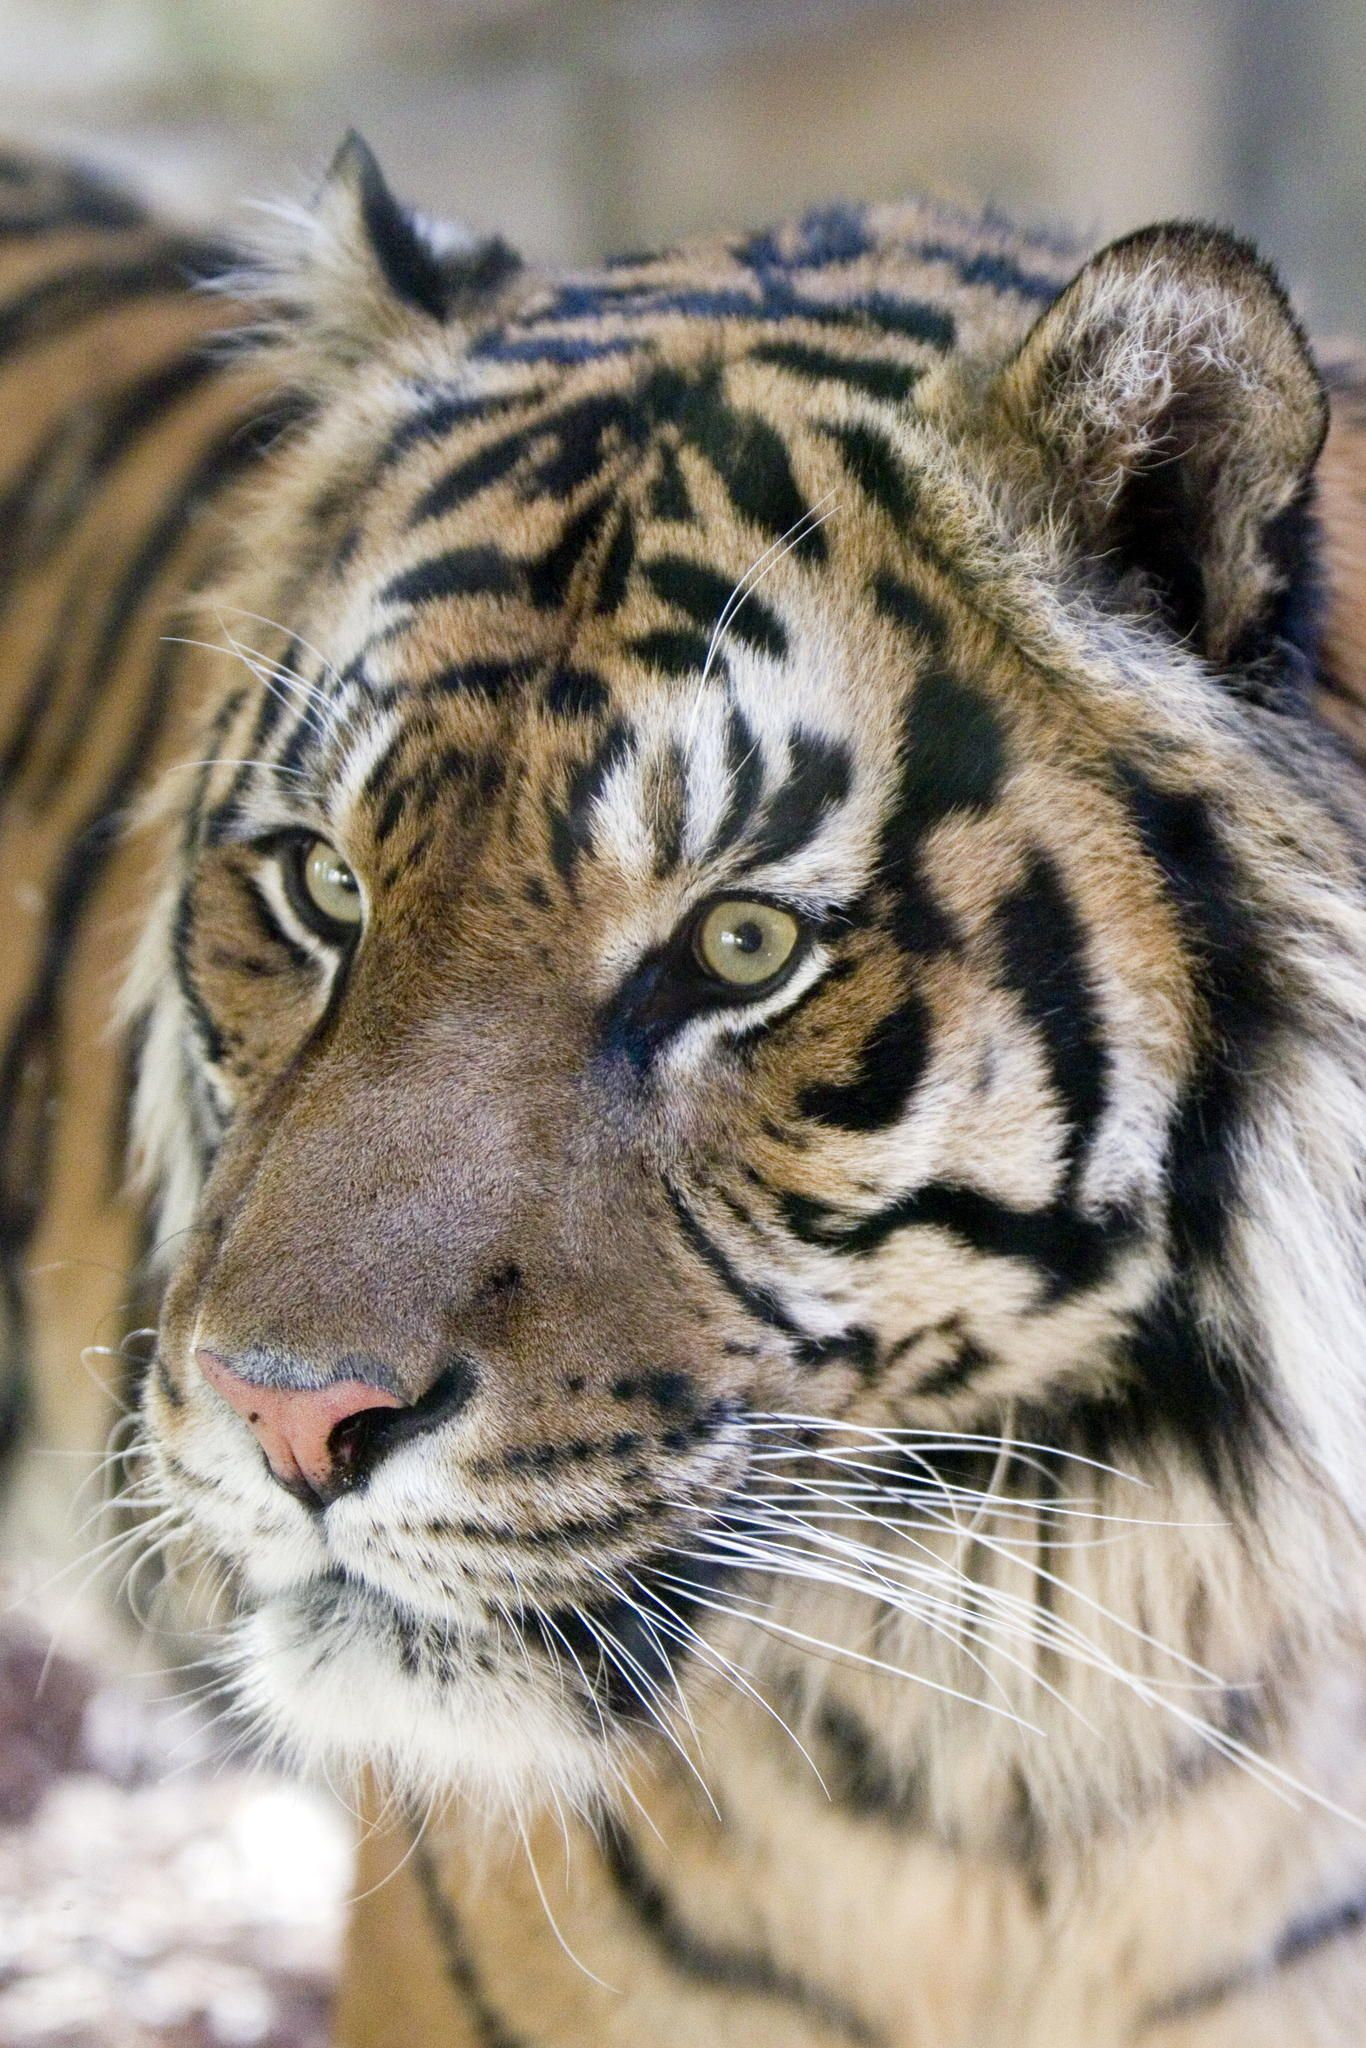 tiger portrait by Erika A B on 500px Tiger, Wild cat